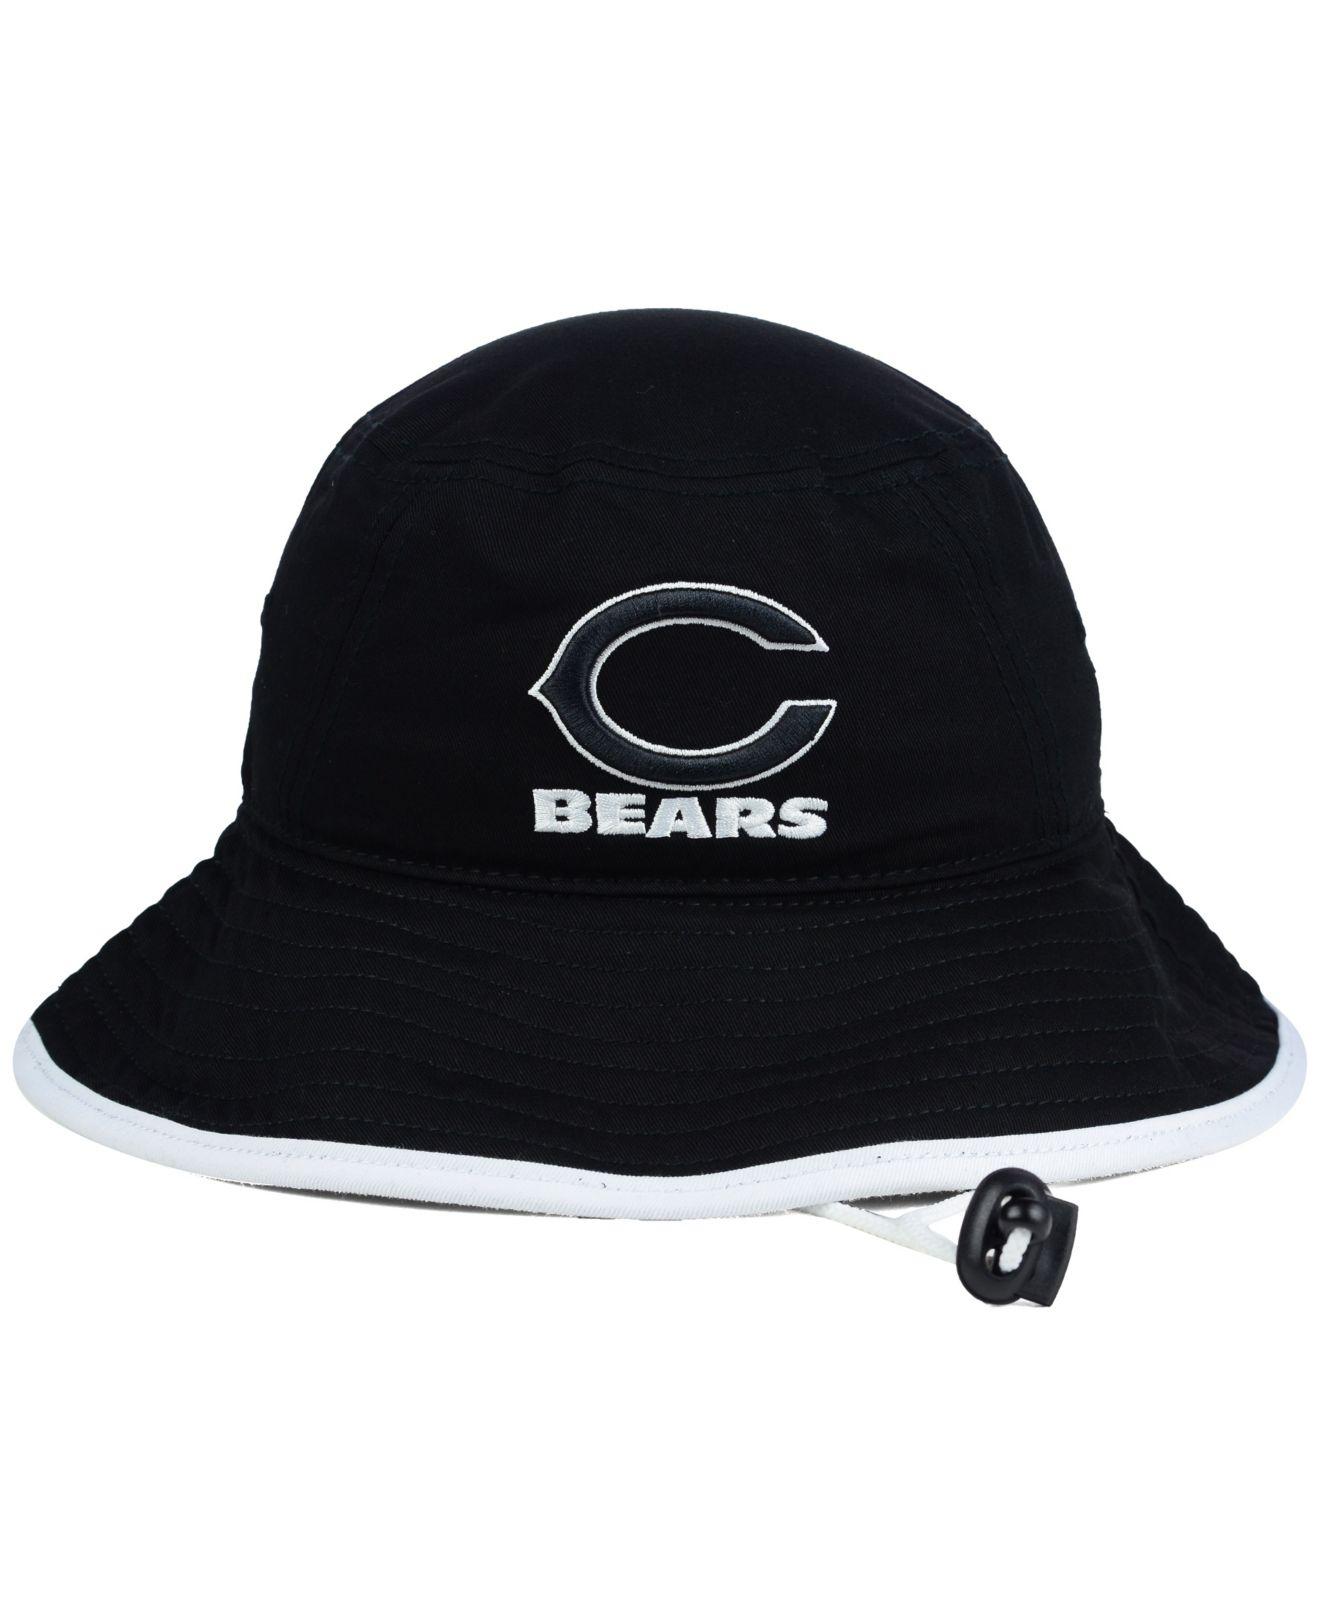 1f0cdf29410 Lyst - KTZ Chicago Bears Nfl Black White Bucket Hat in Black